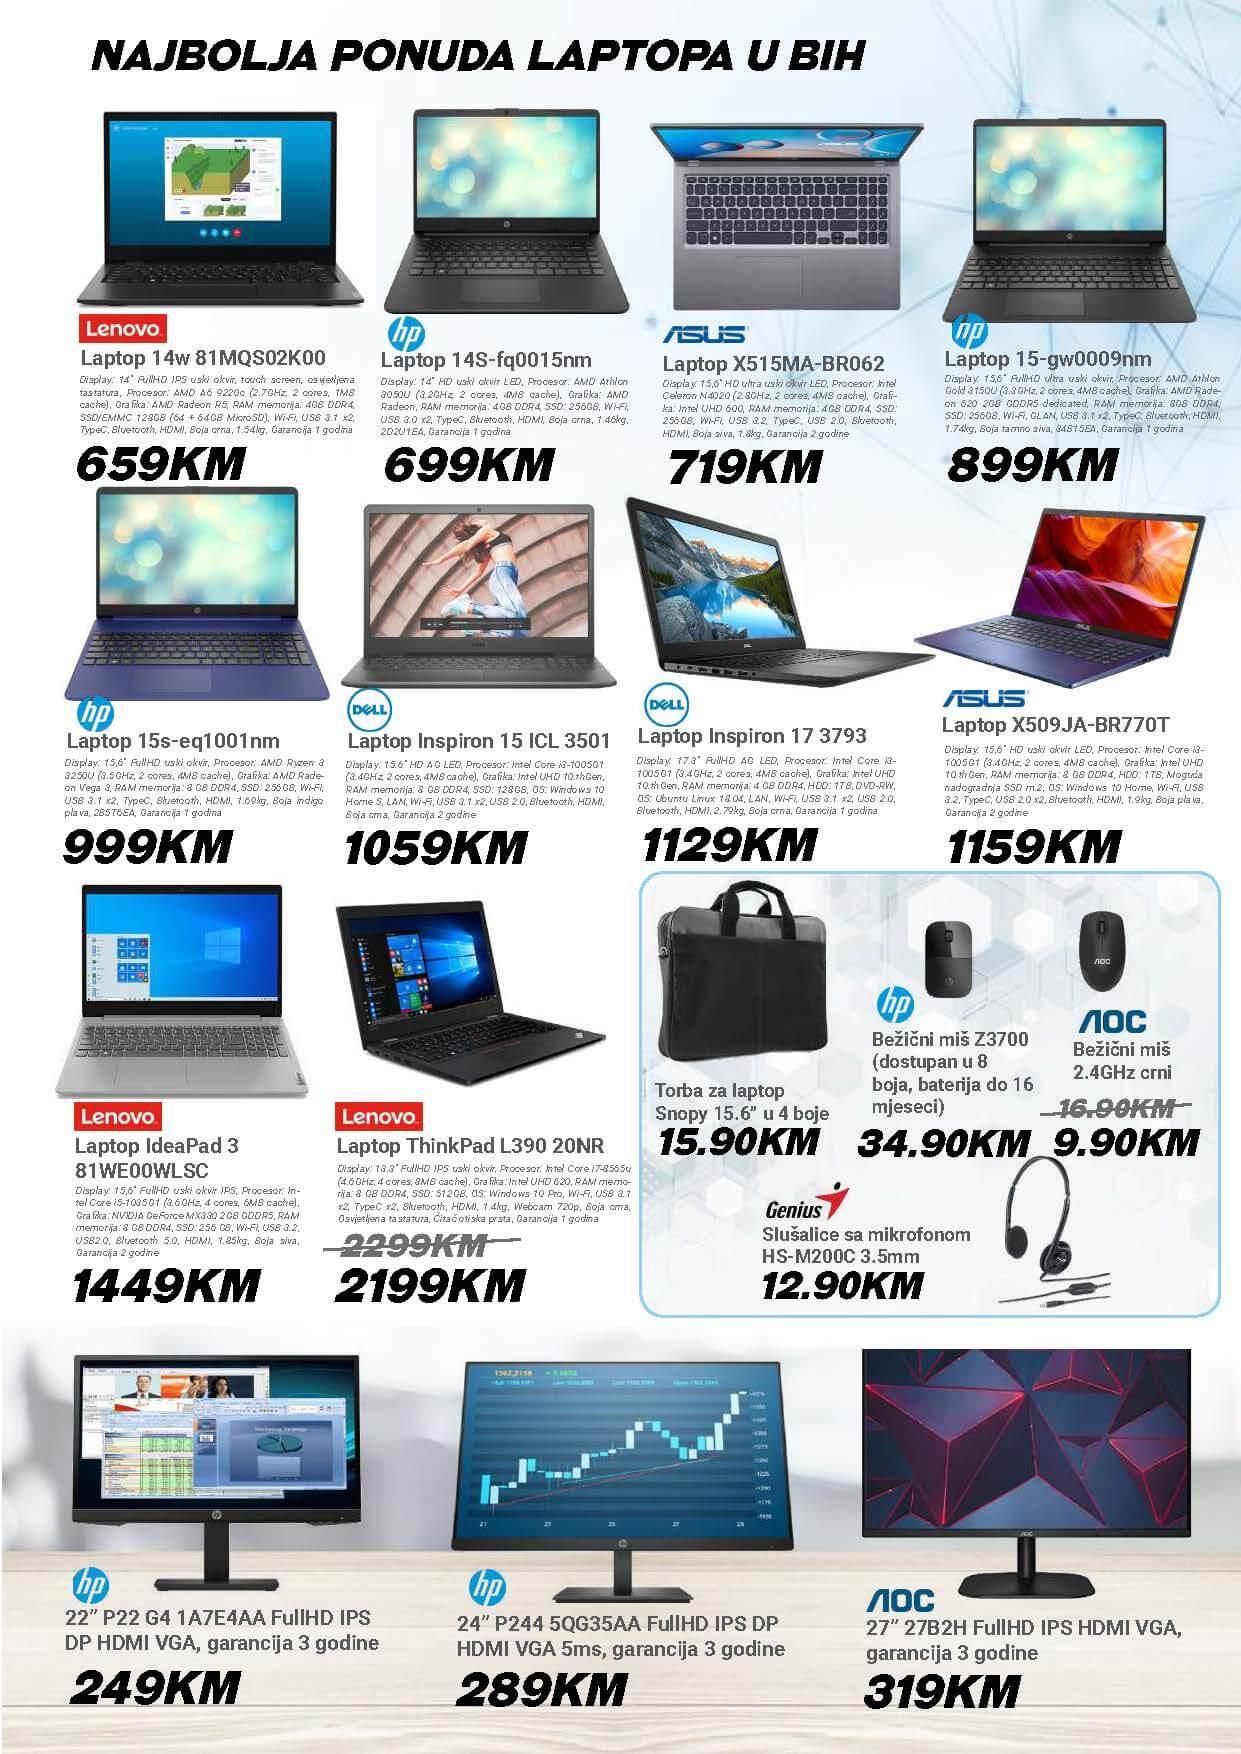 DOMOD Katalog Akcija MAJ 2021 07.05.2021. 28.05.2021. Page 07